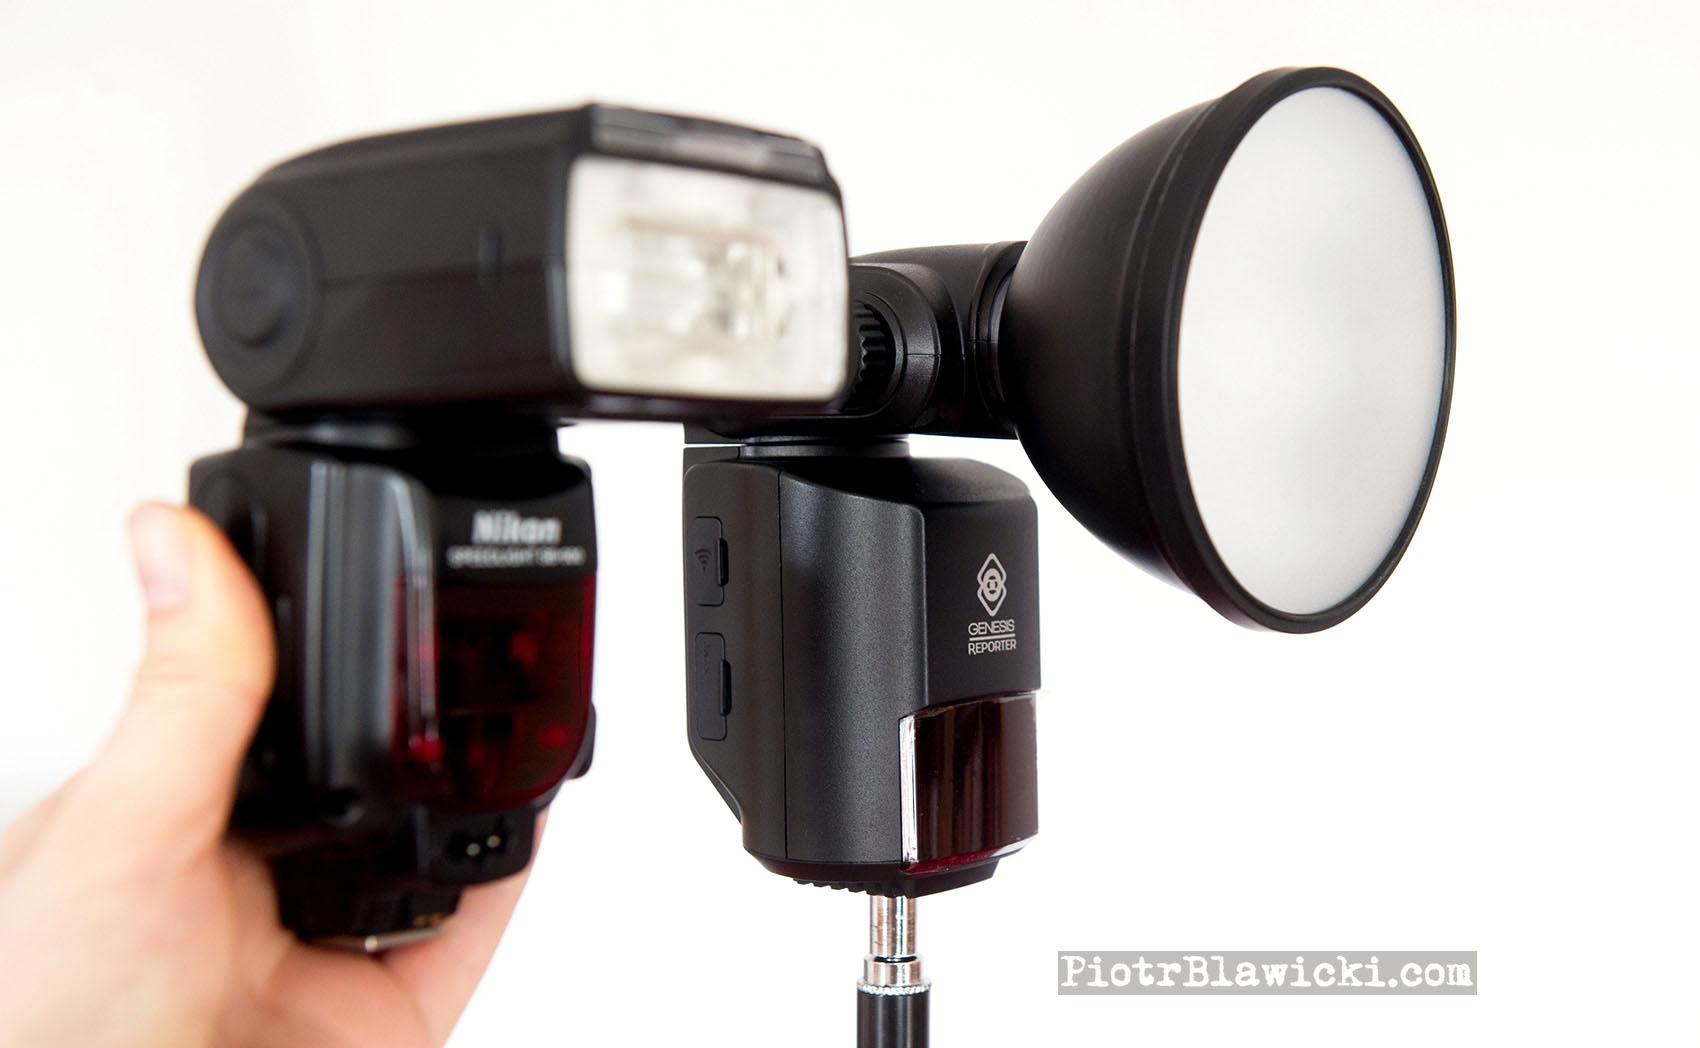 genesis-reporter-360-fotoblog-04